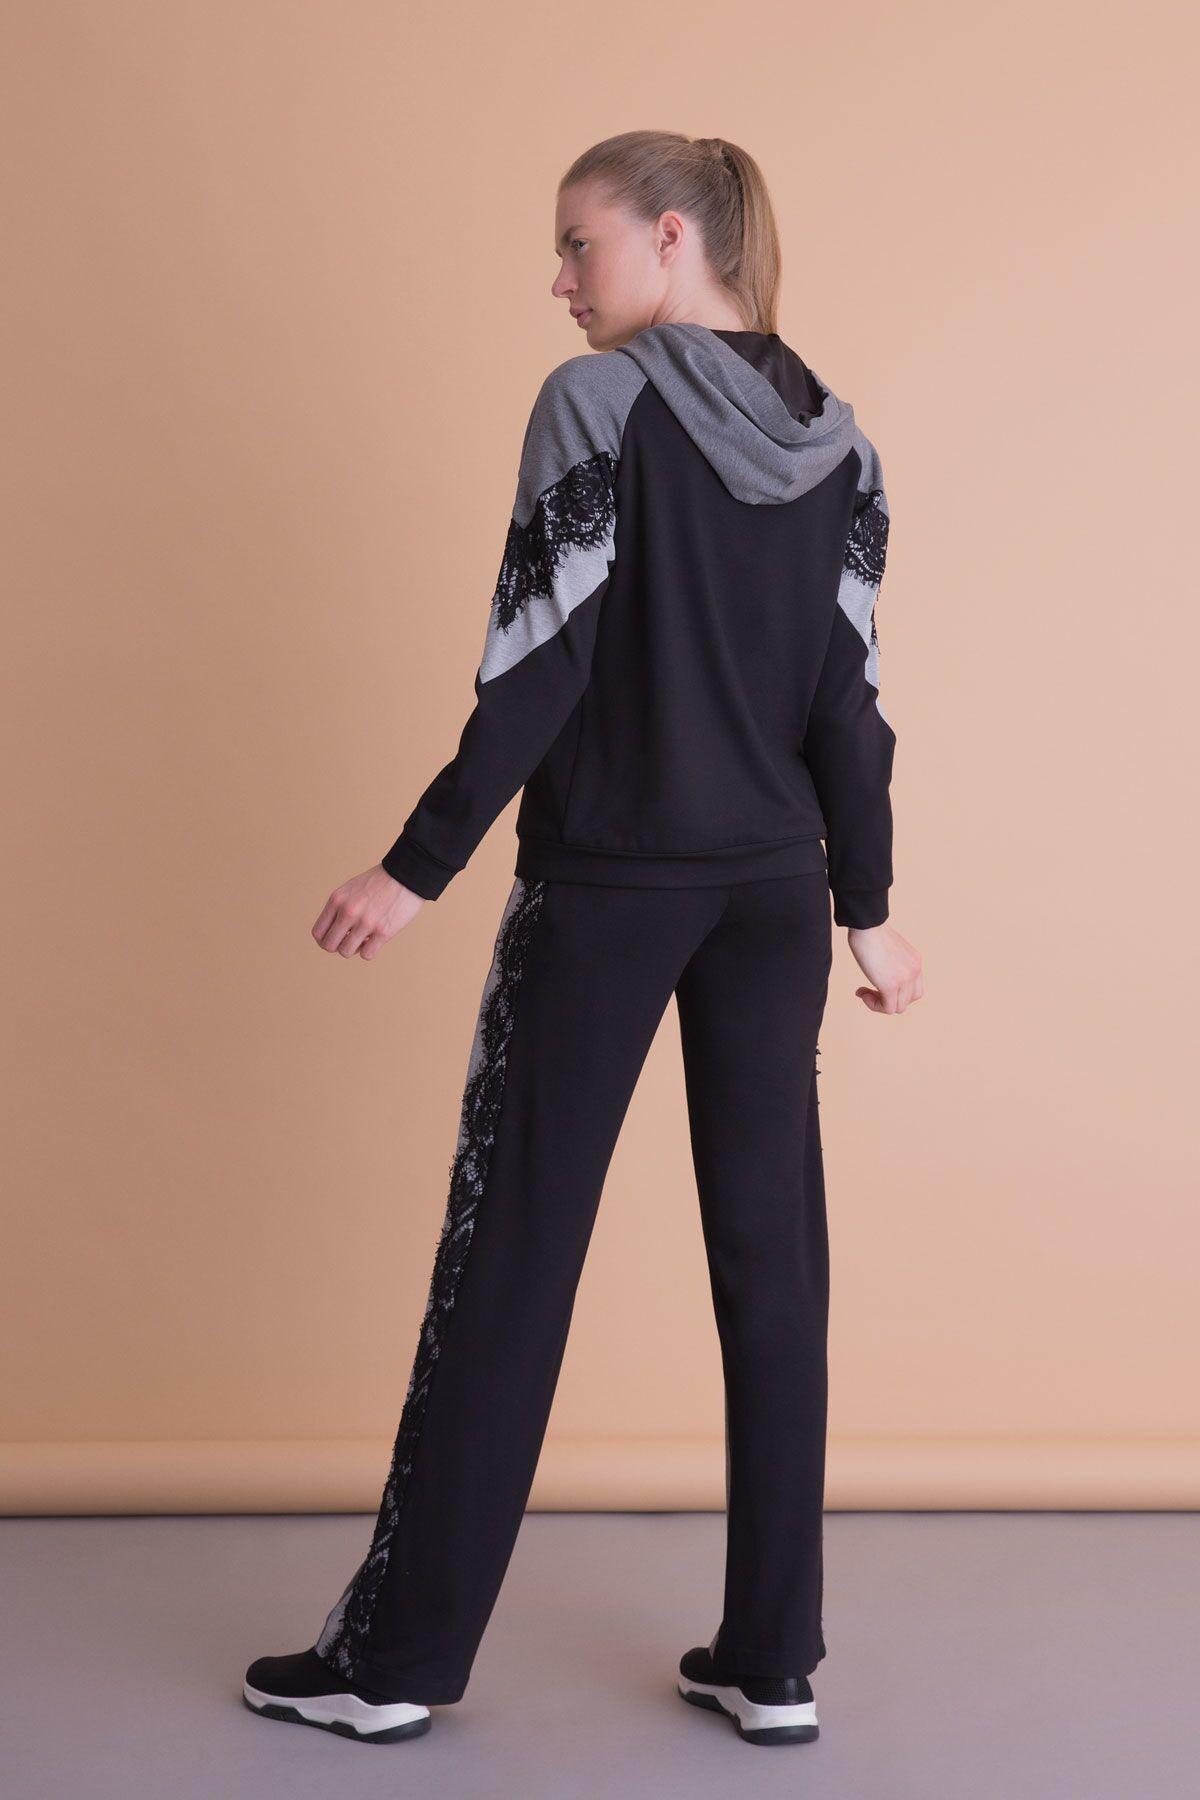 Dantel Detaylı Siyah Antrasit Kapüşonlu Sweatshirt